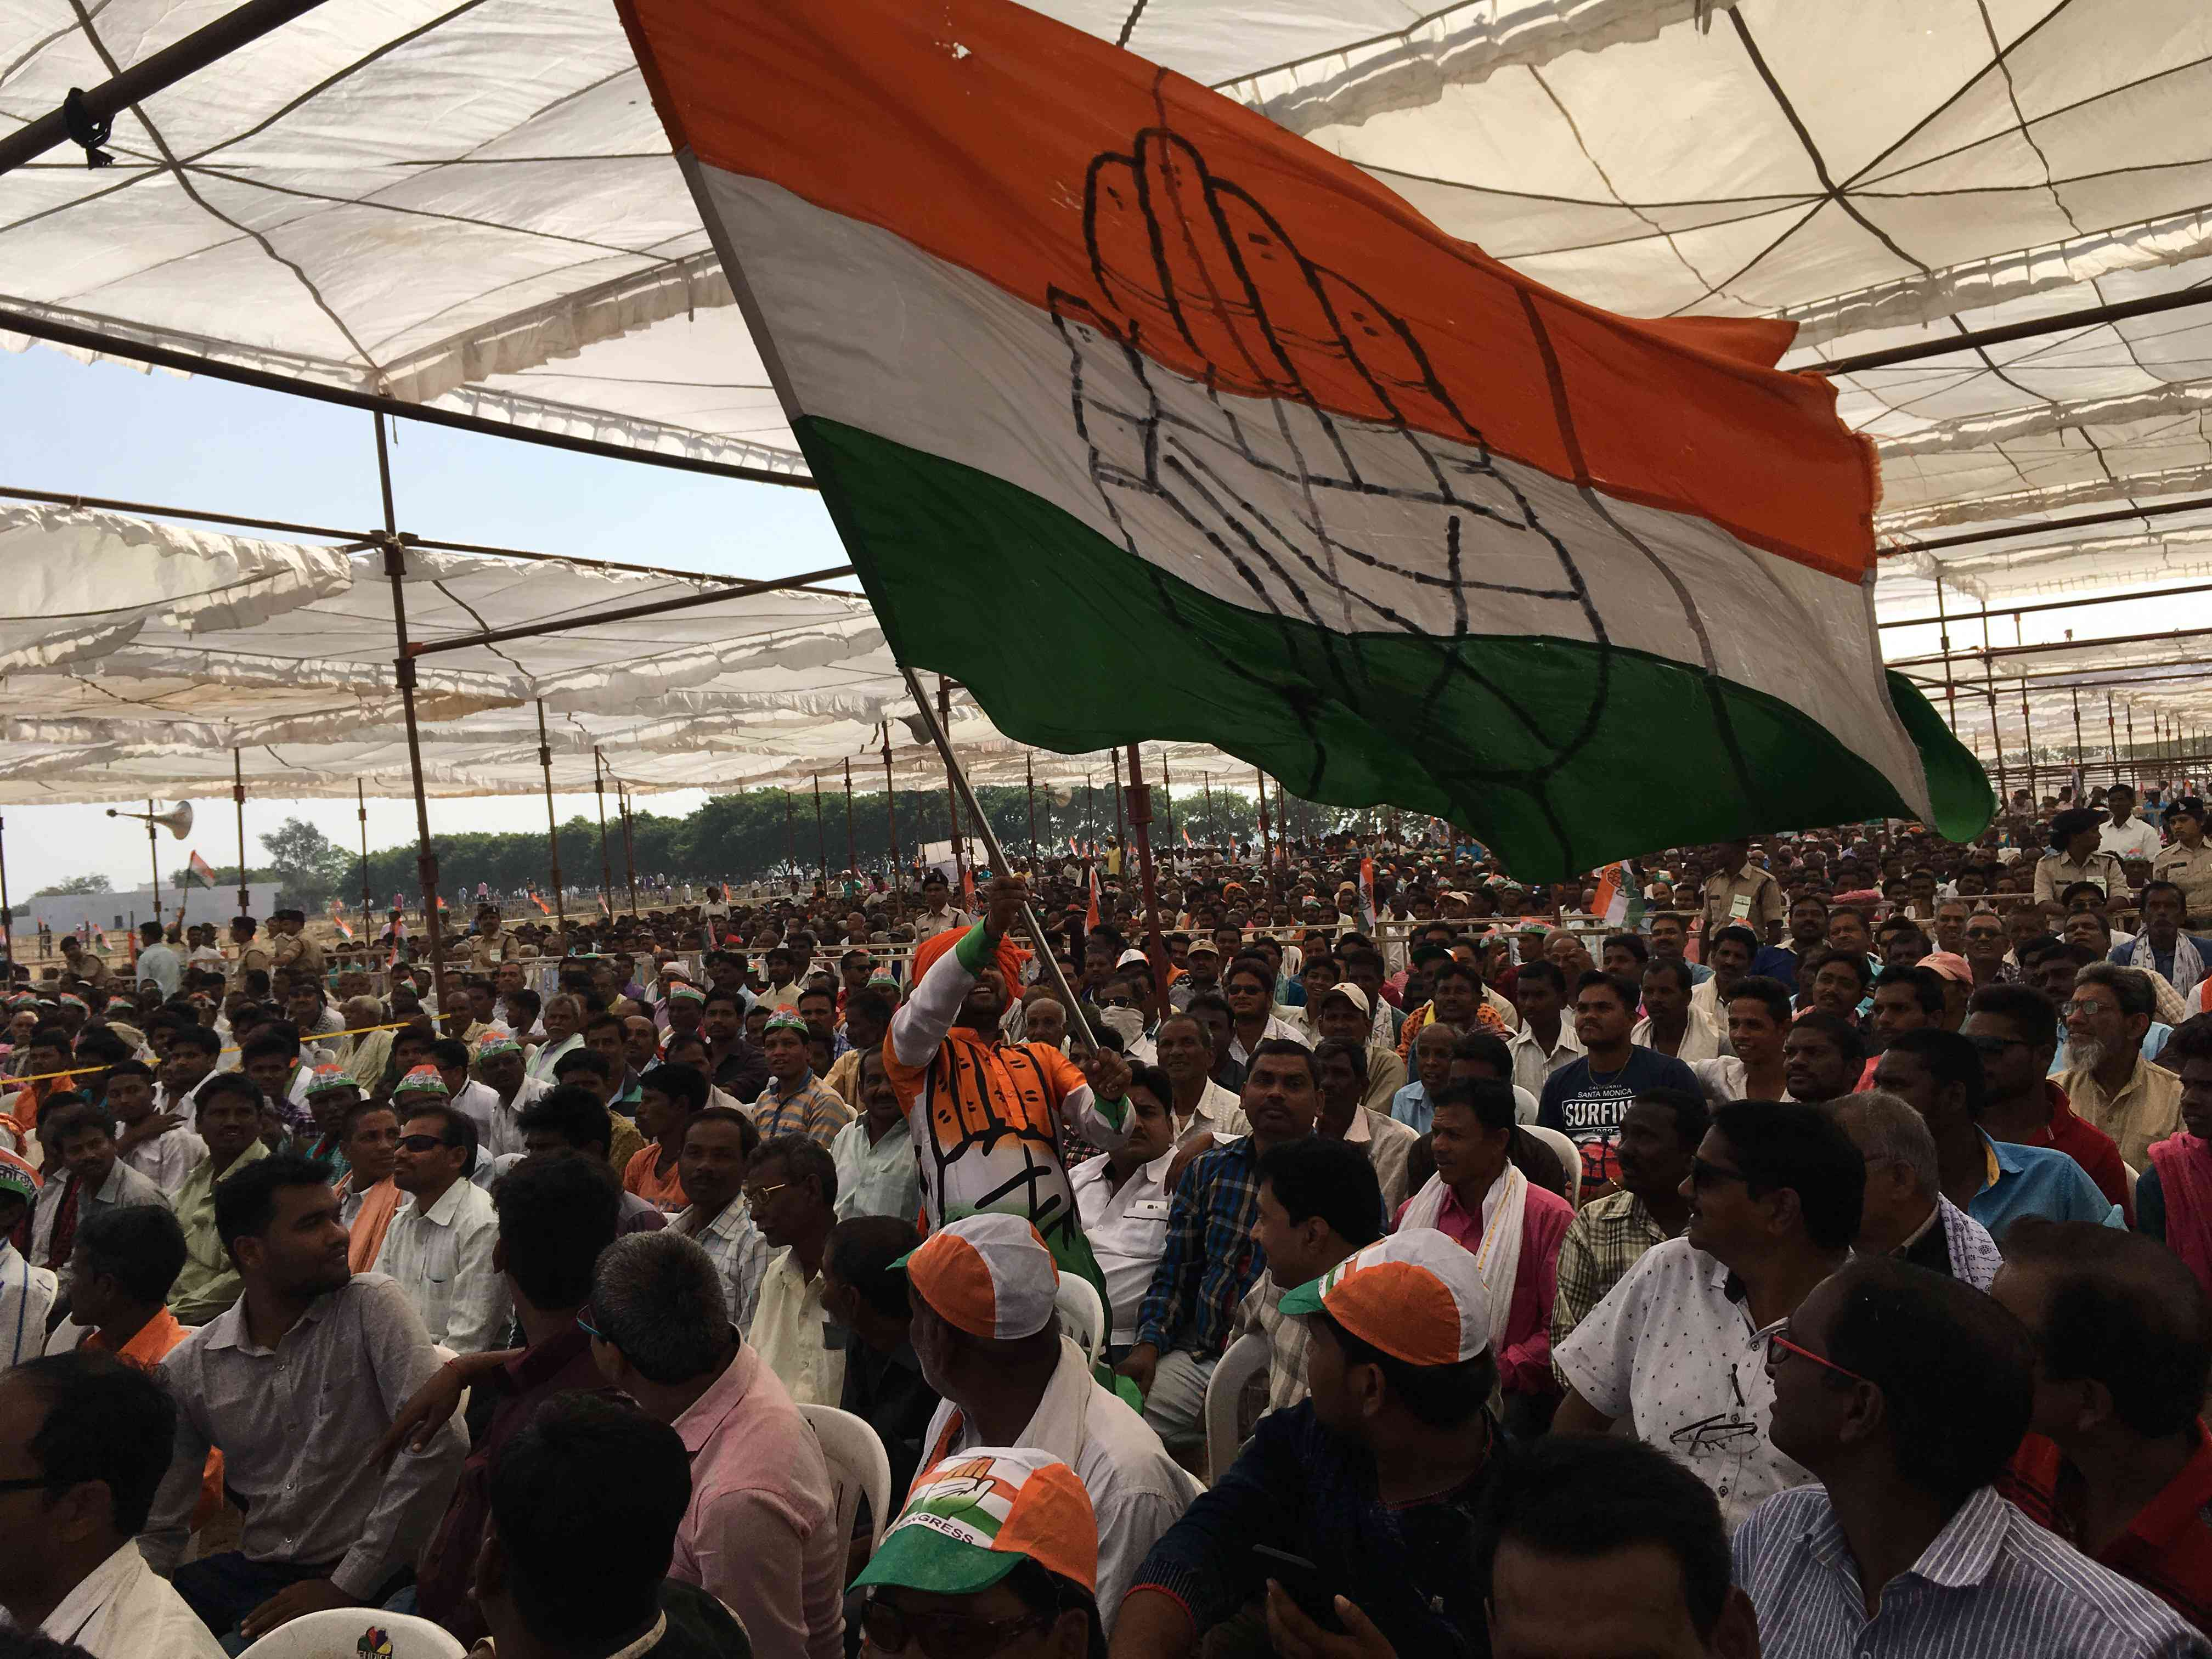 Rahul Gandhi's rally in Mahasamund attracted a huge crowd. Photo credit: Akash Bisht